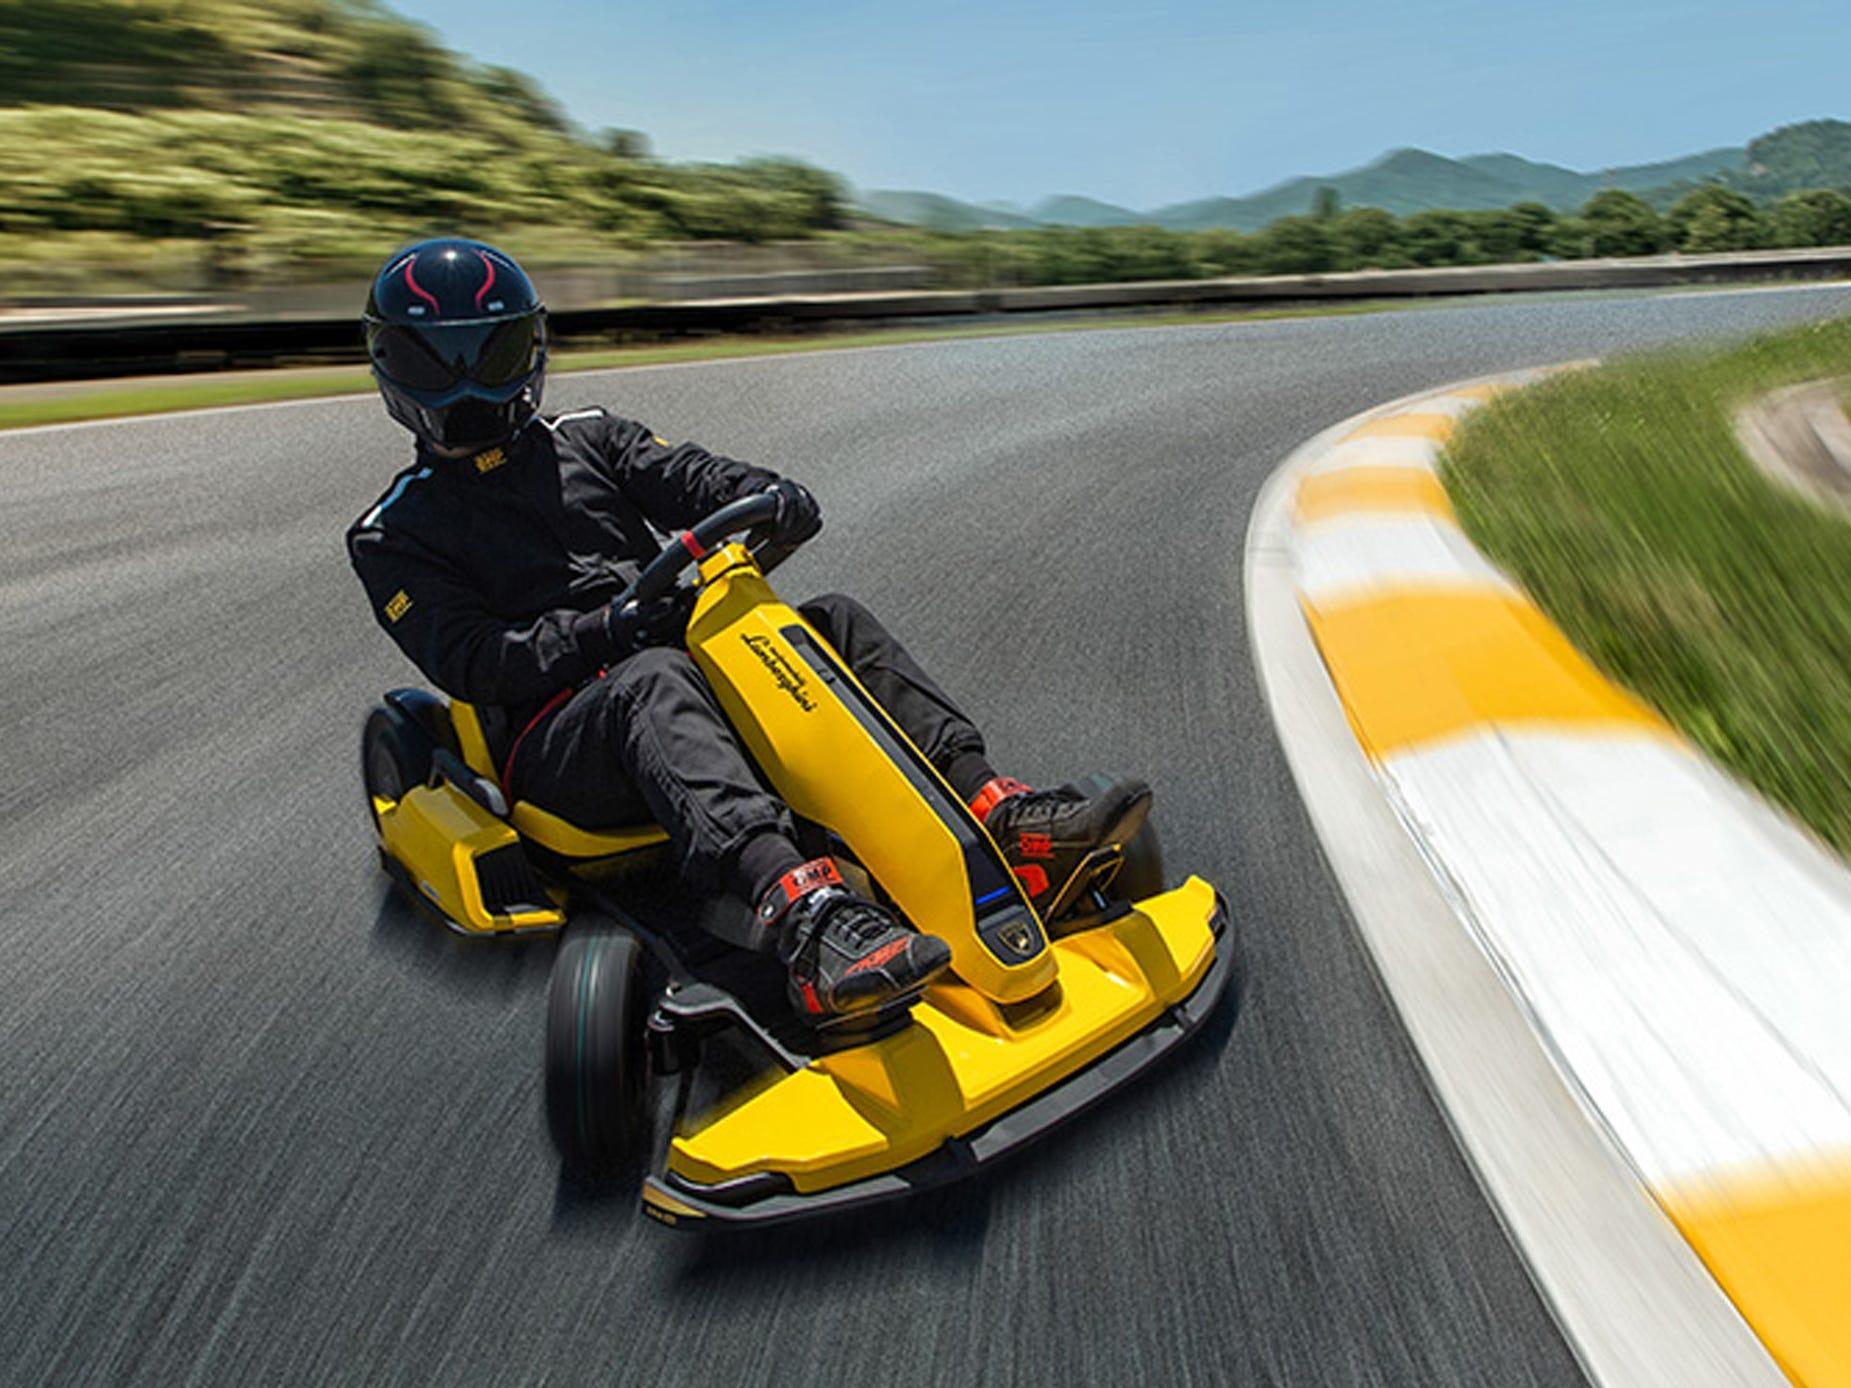 Lamborghini partnered with Segway to create a drifting electric go-kart